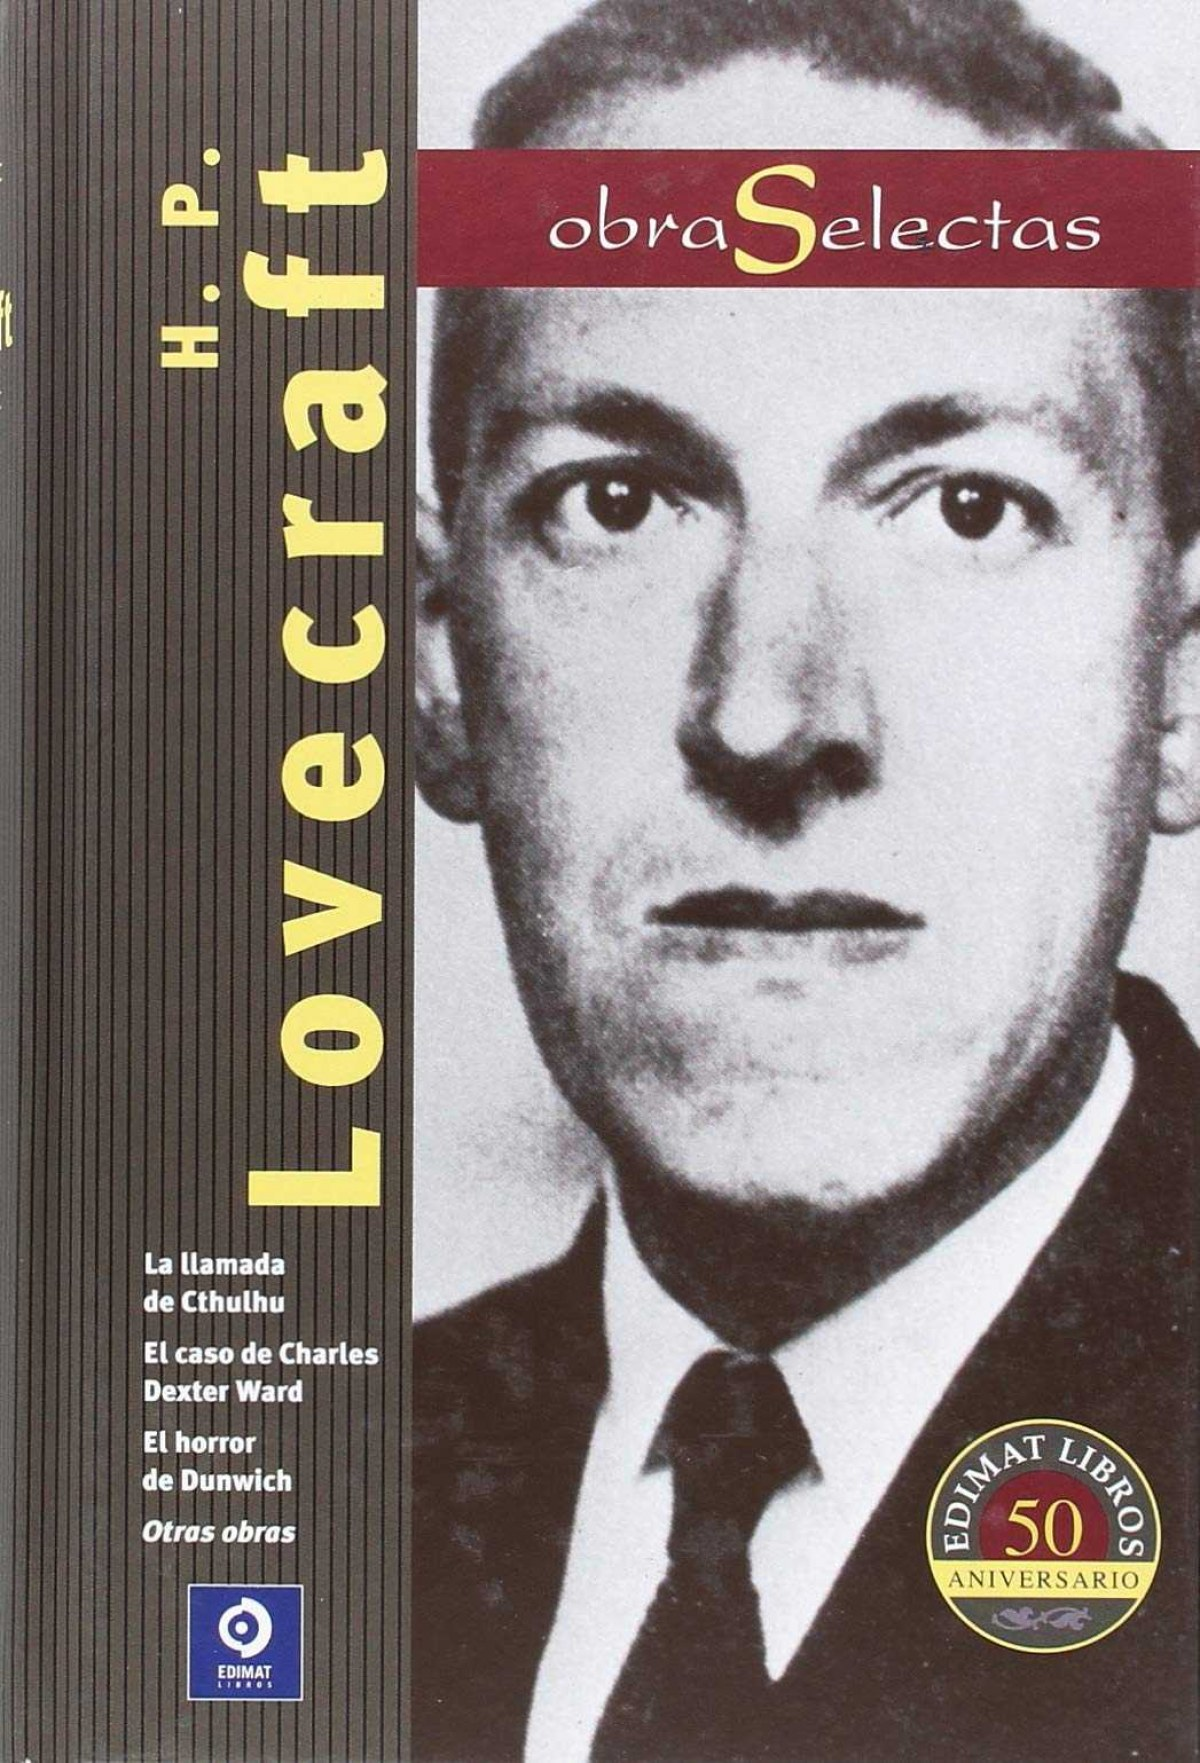 Obras selectas H.P. Lovecraft